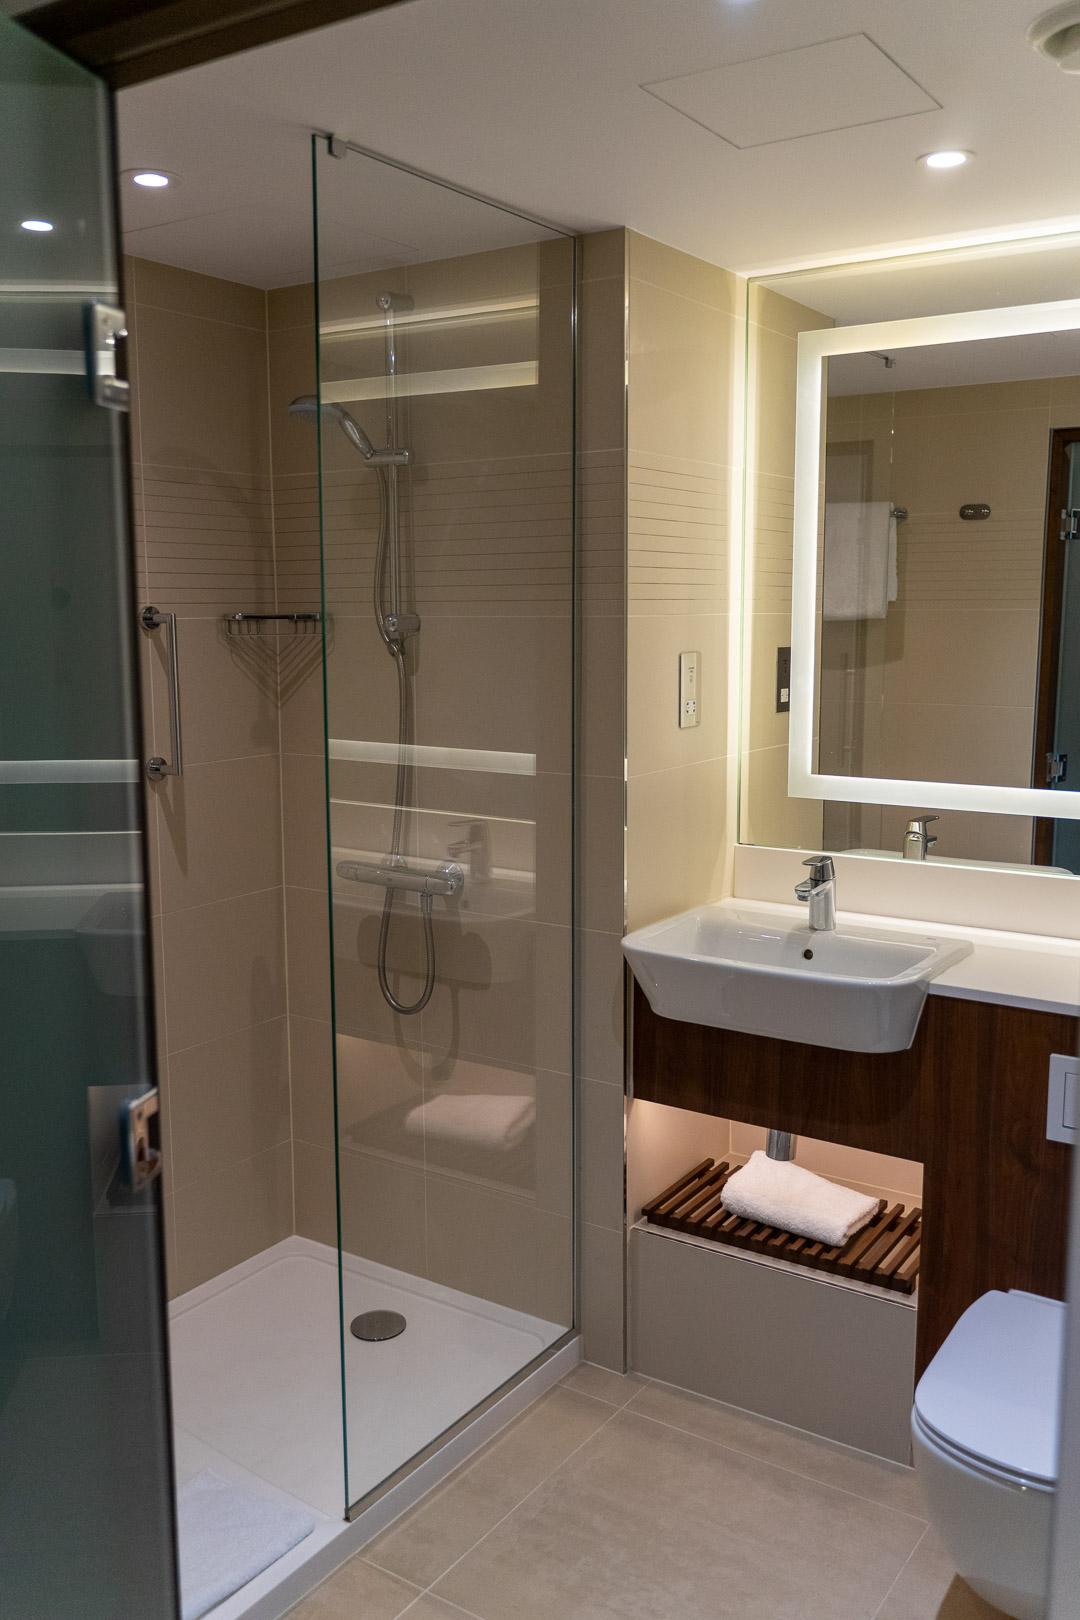 Marriott Courtyard Bathroom